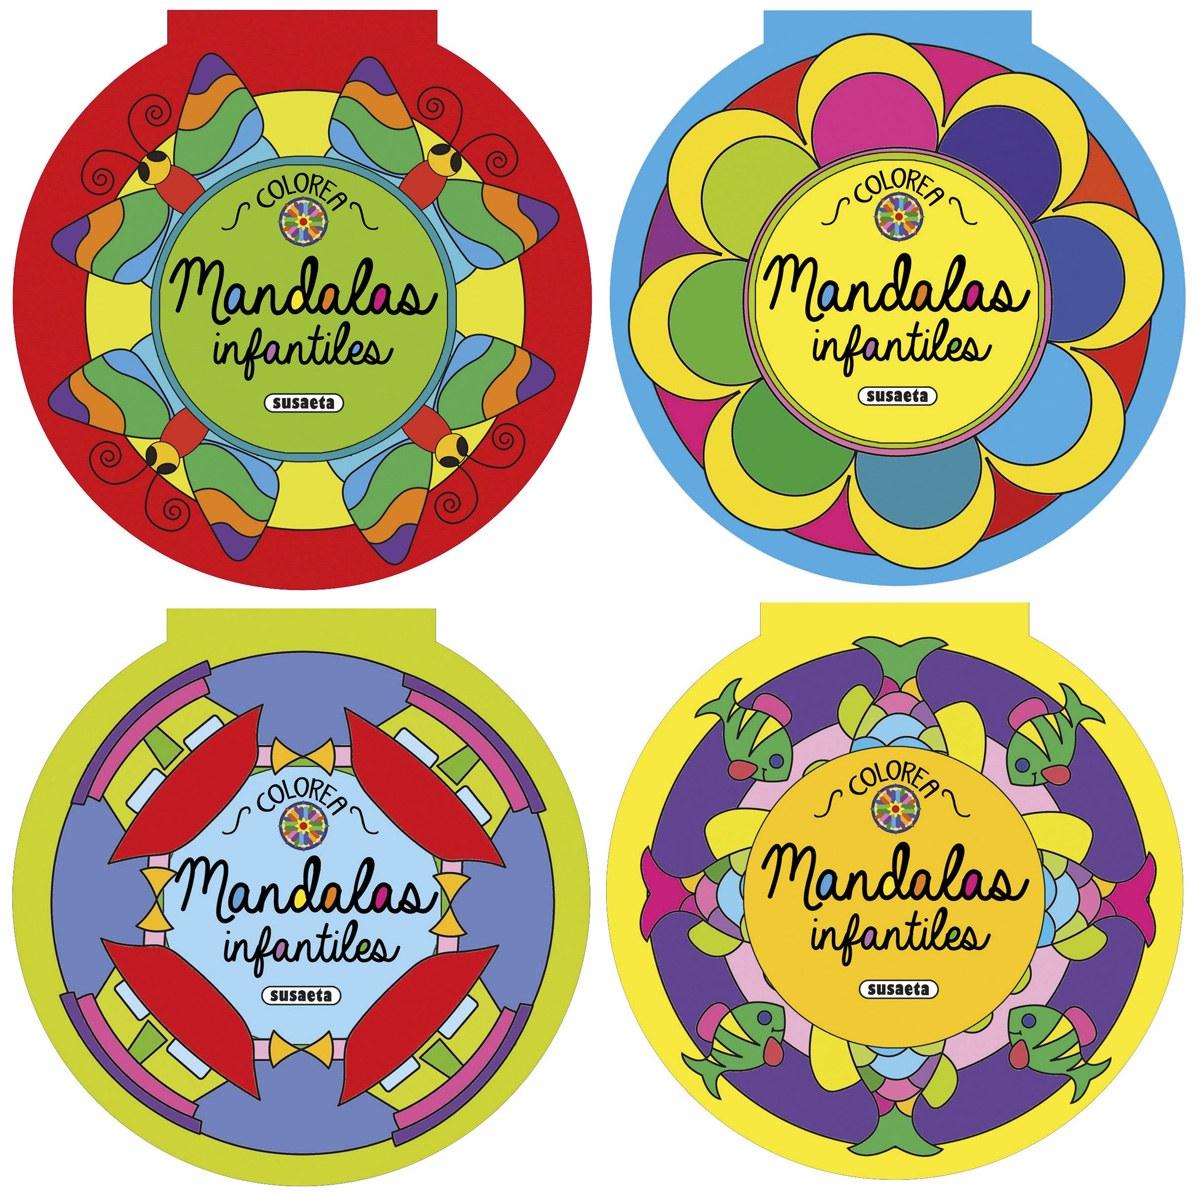 Mandalas infantiles 9788467747911